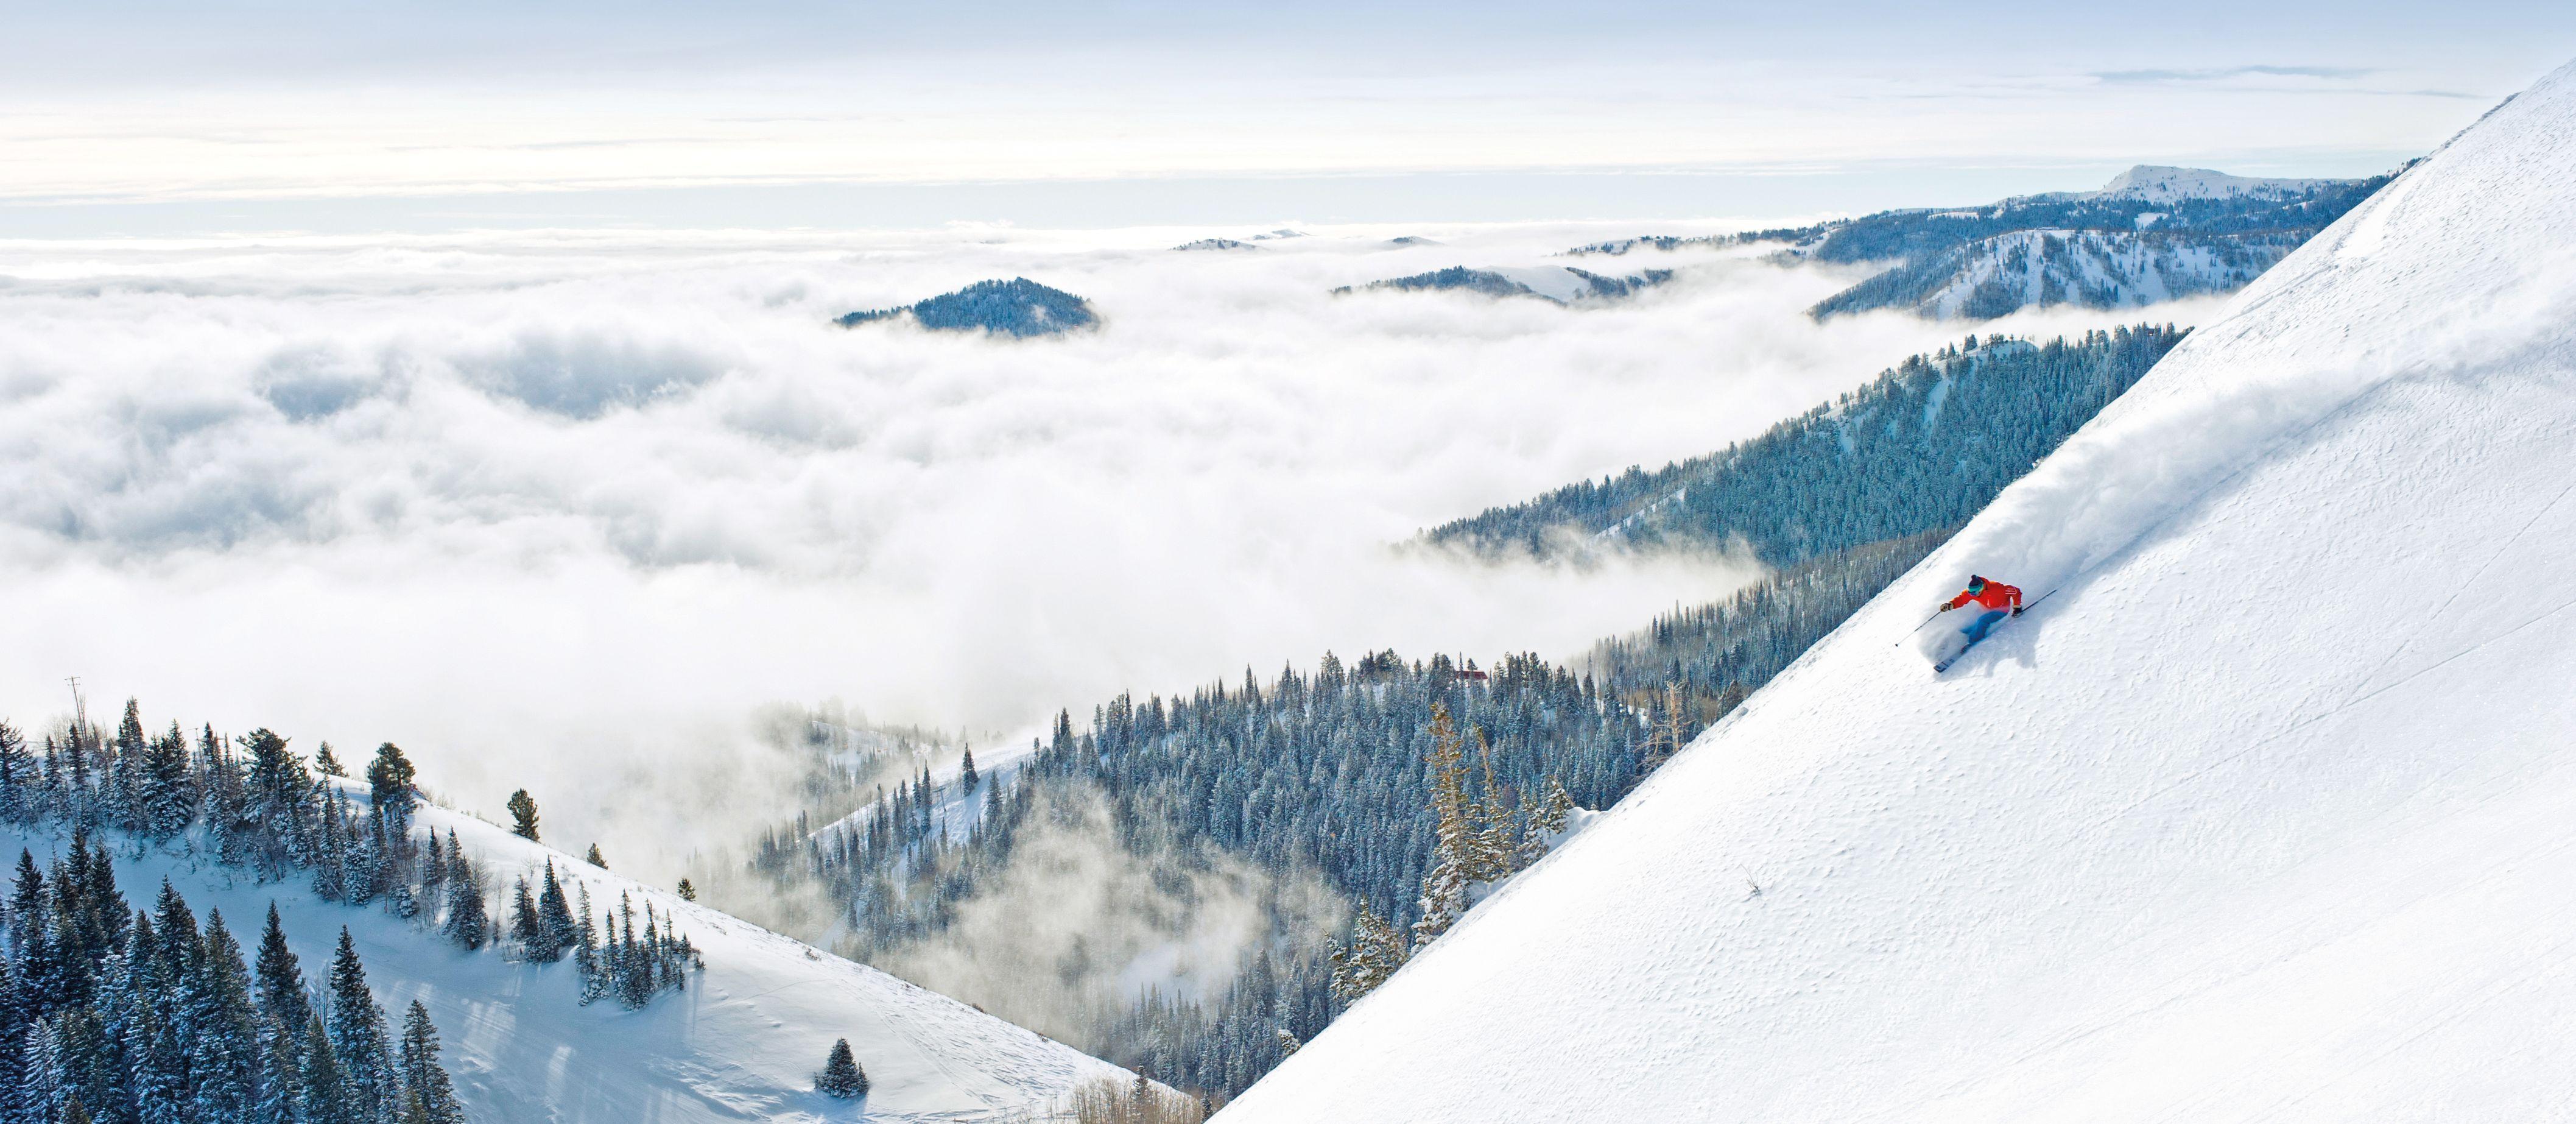 Abfahrt im Skigebiet The Canyons